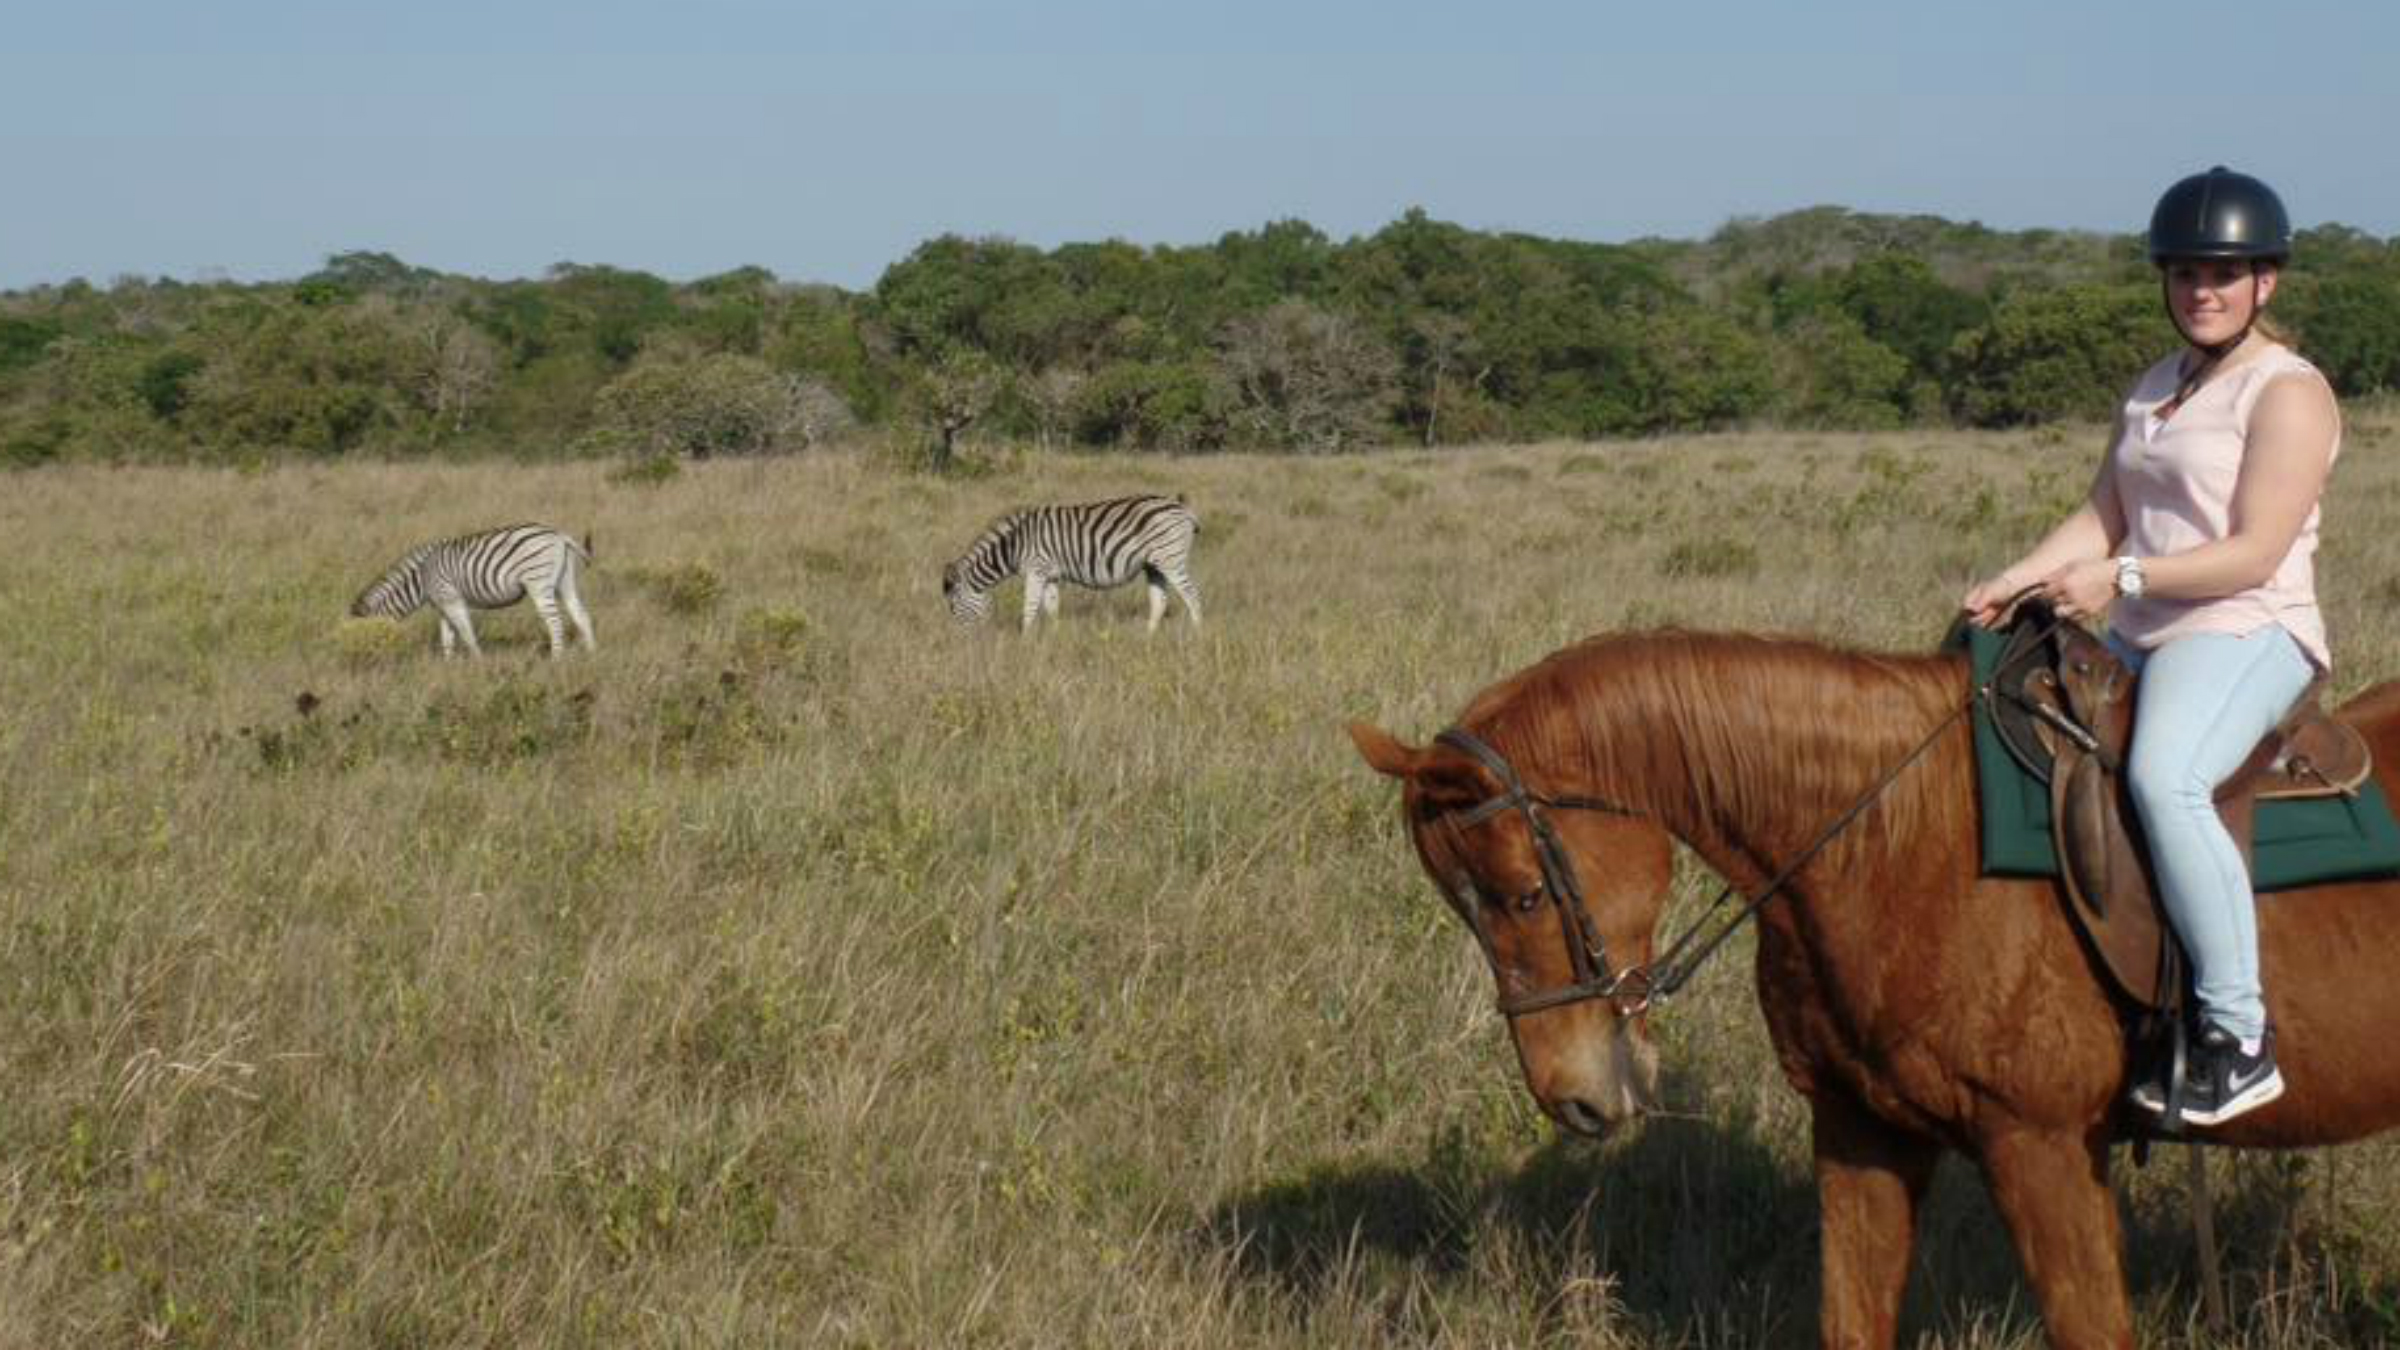 Paardensafari zuid afrika 2400x1350